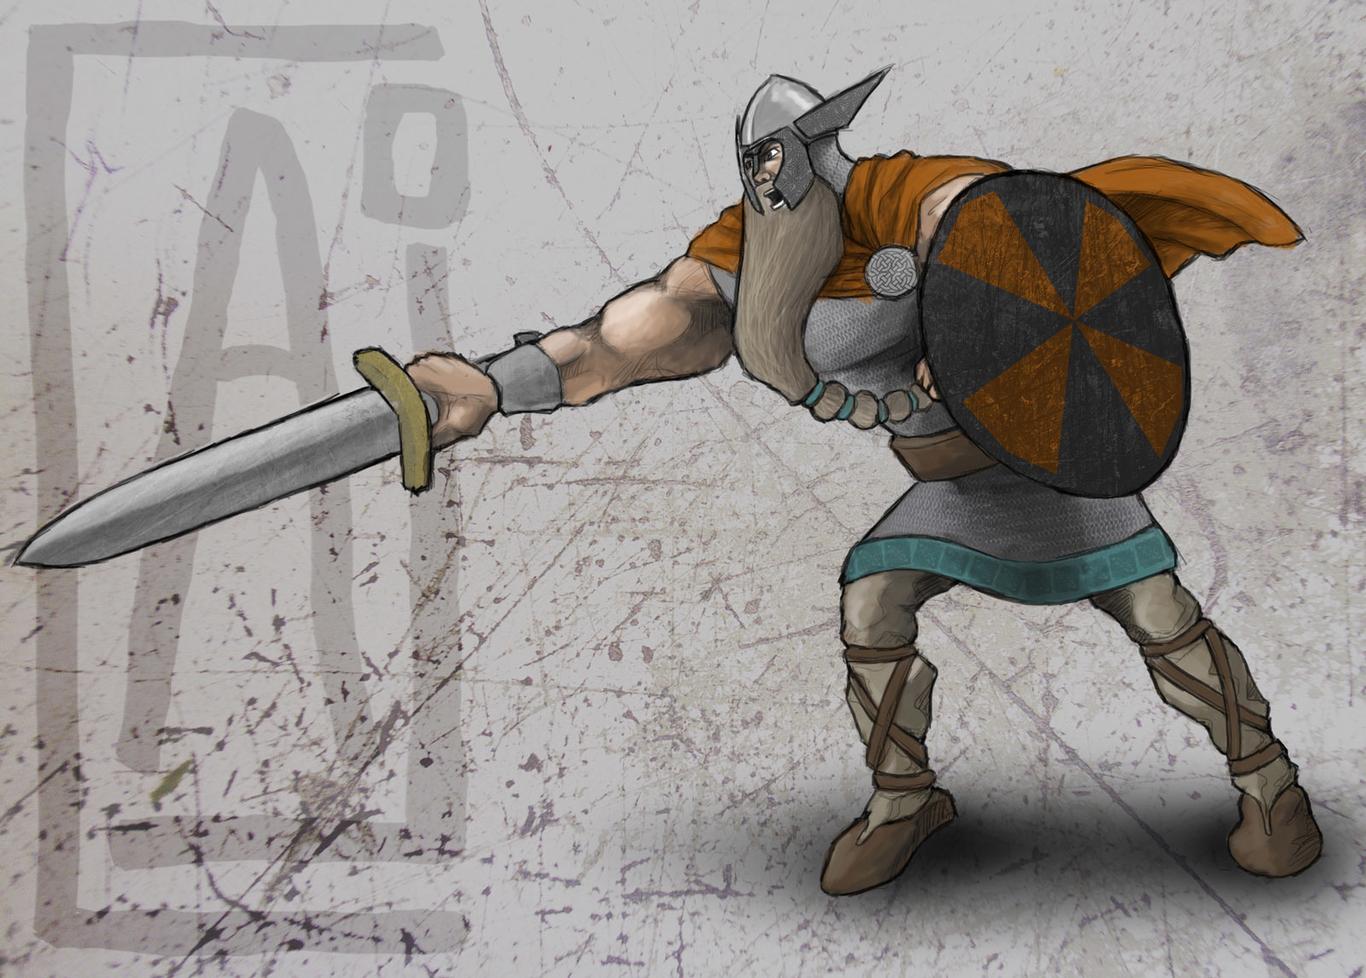 Azzant viking attack 1 a462cc71 7ebx